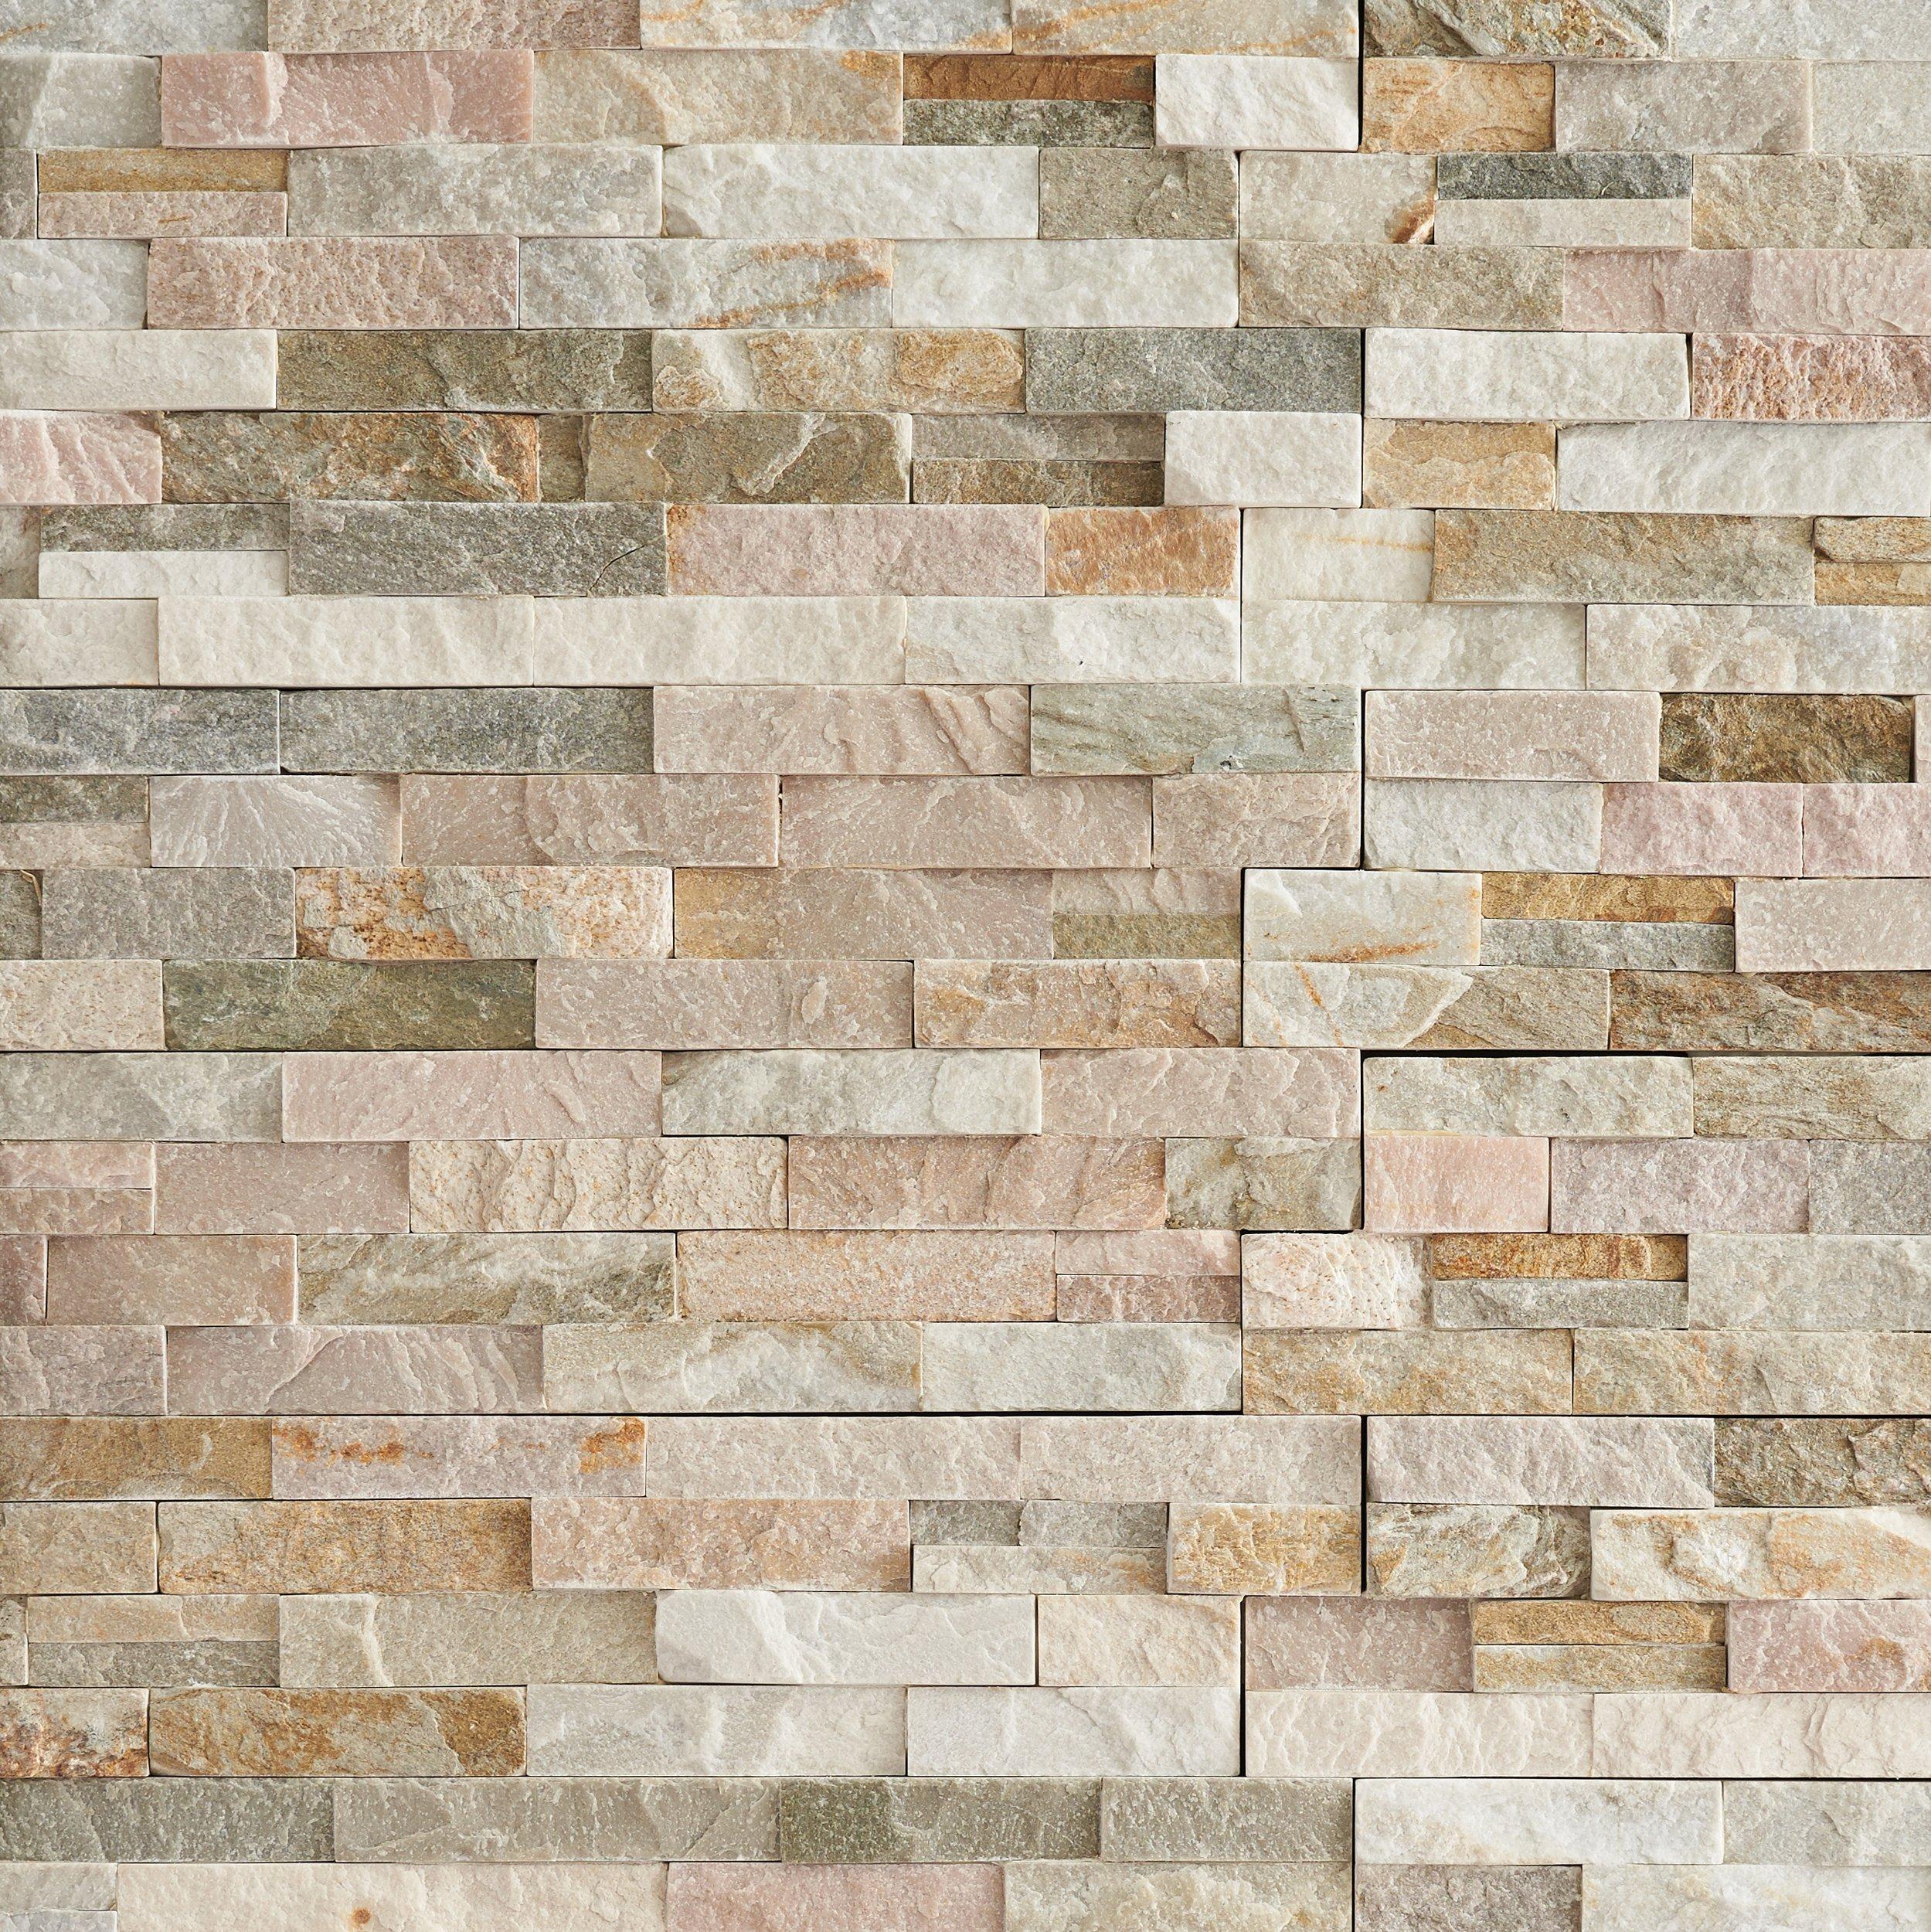 stacked stone ledger panel floor decor